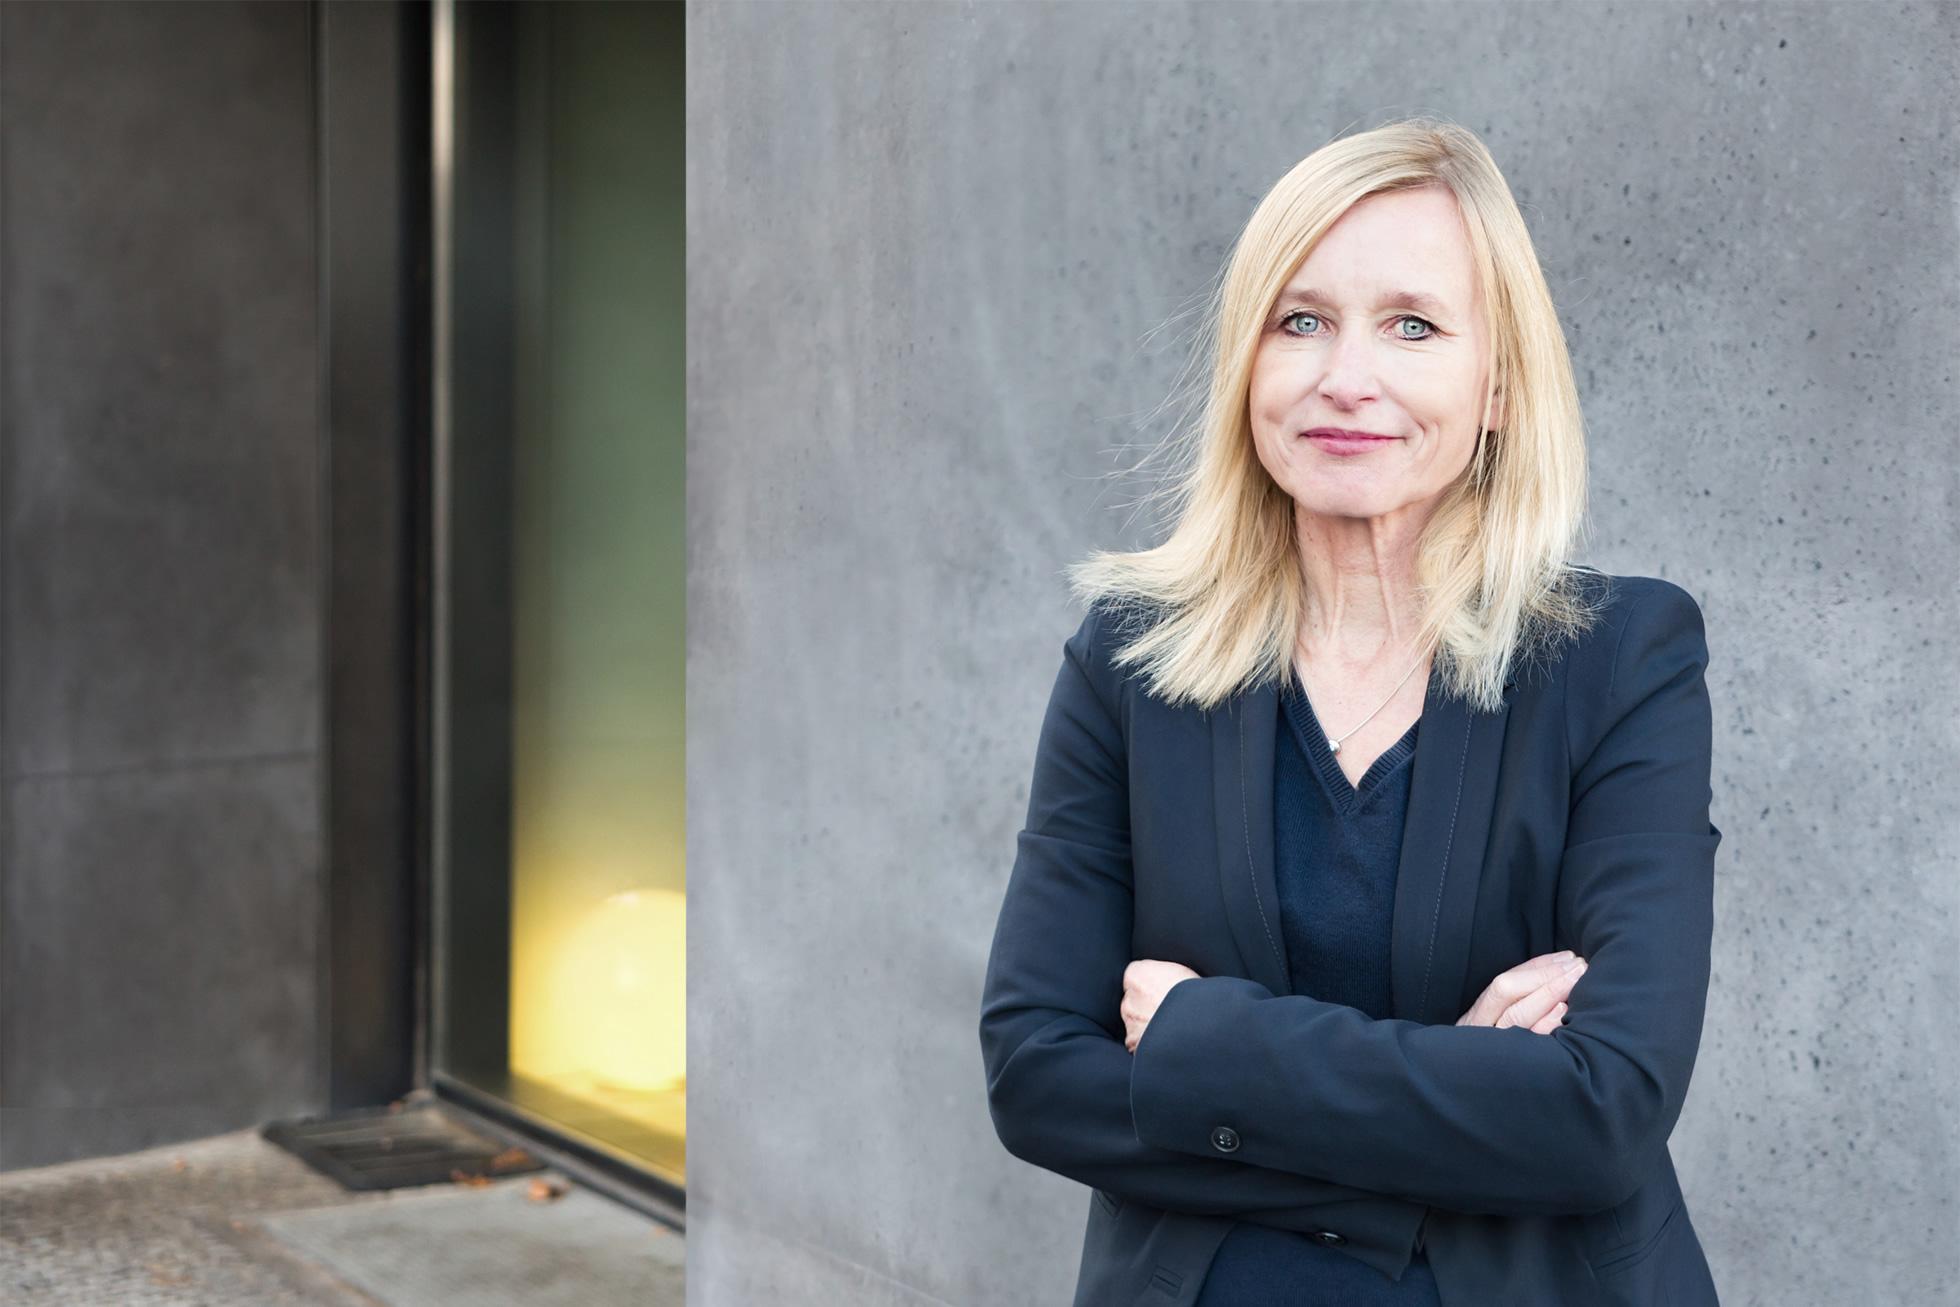 Bettina Redeker Rechtsanwältin Berlin